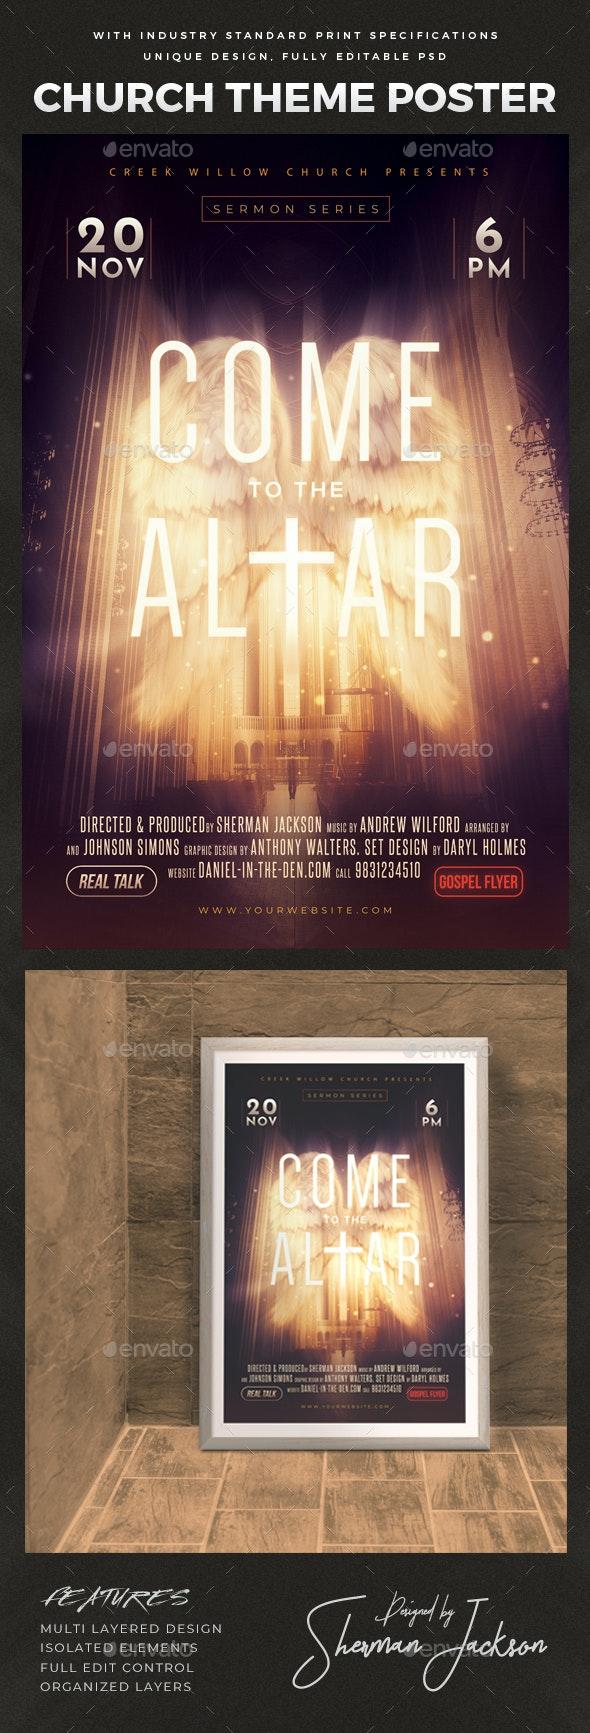 Church Themed Event Poster - The Altar - Church Flyers